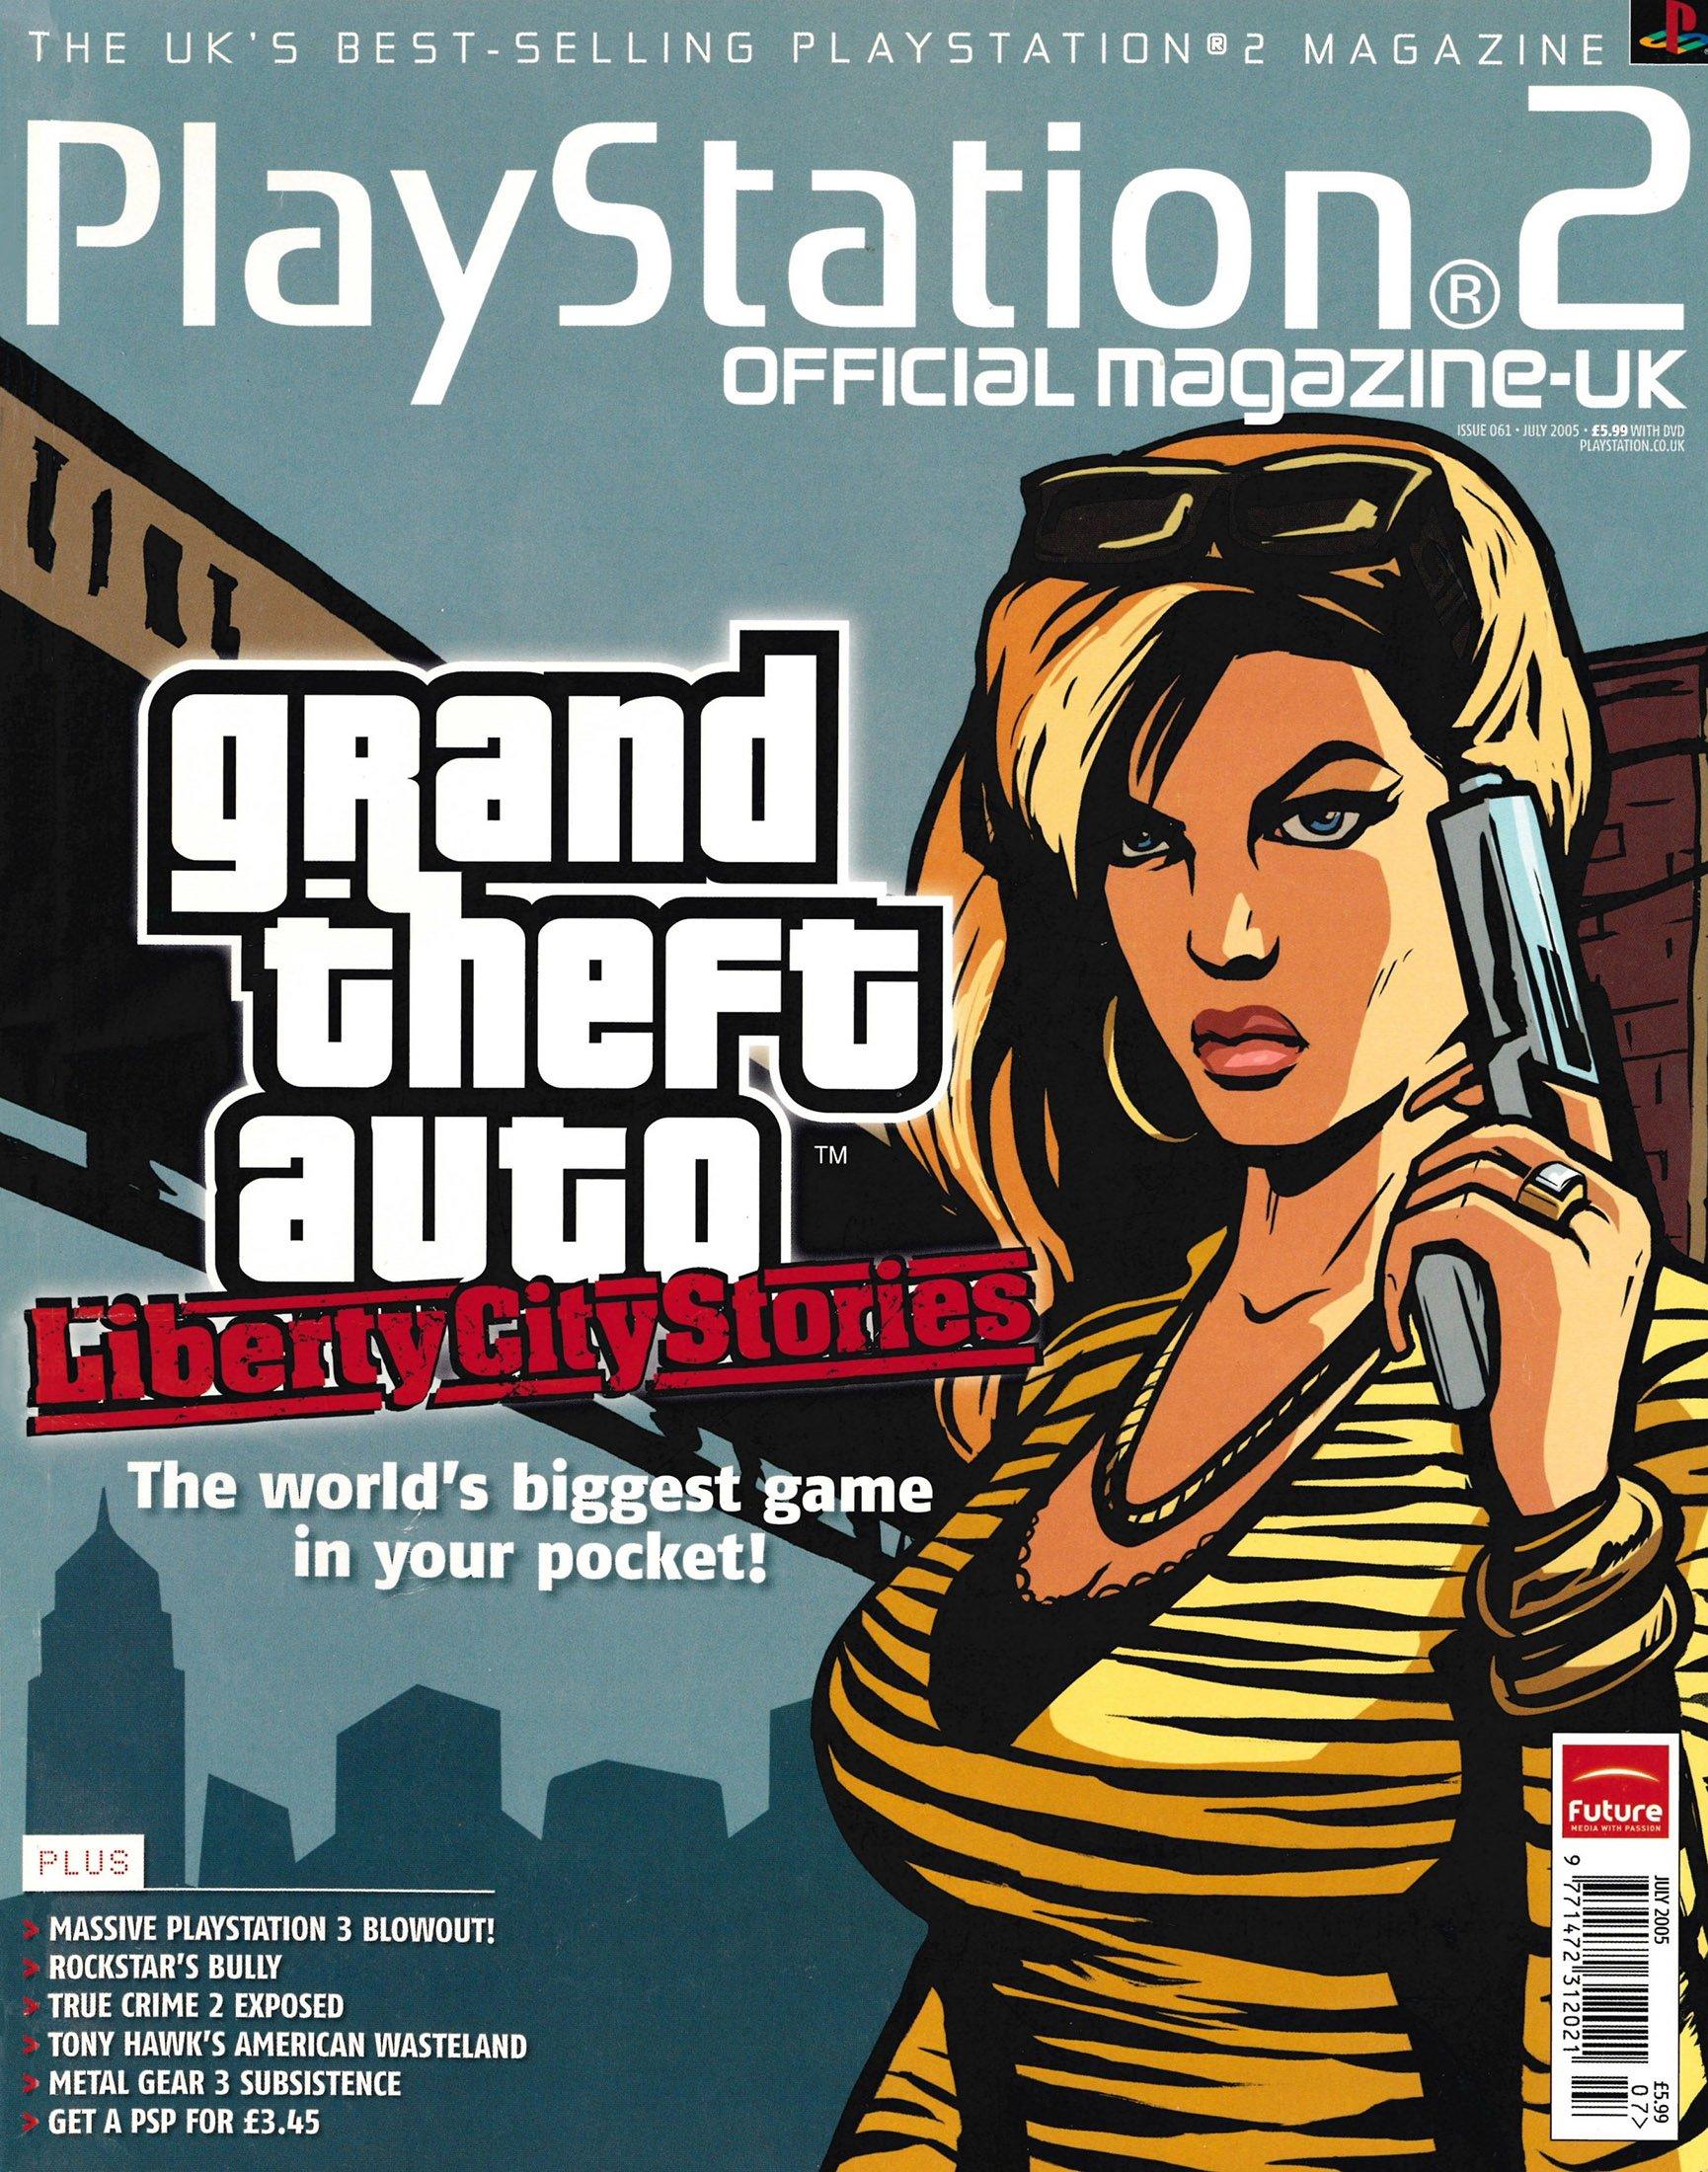 Official Playstation 2 Magazine UK 061 (July 2005)